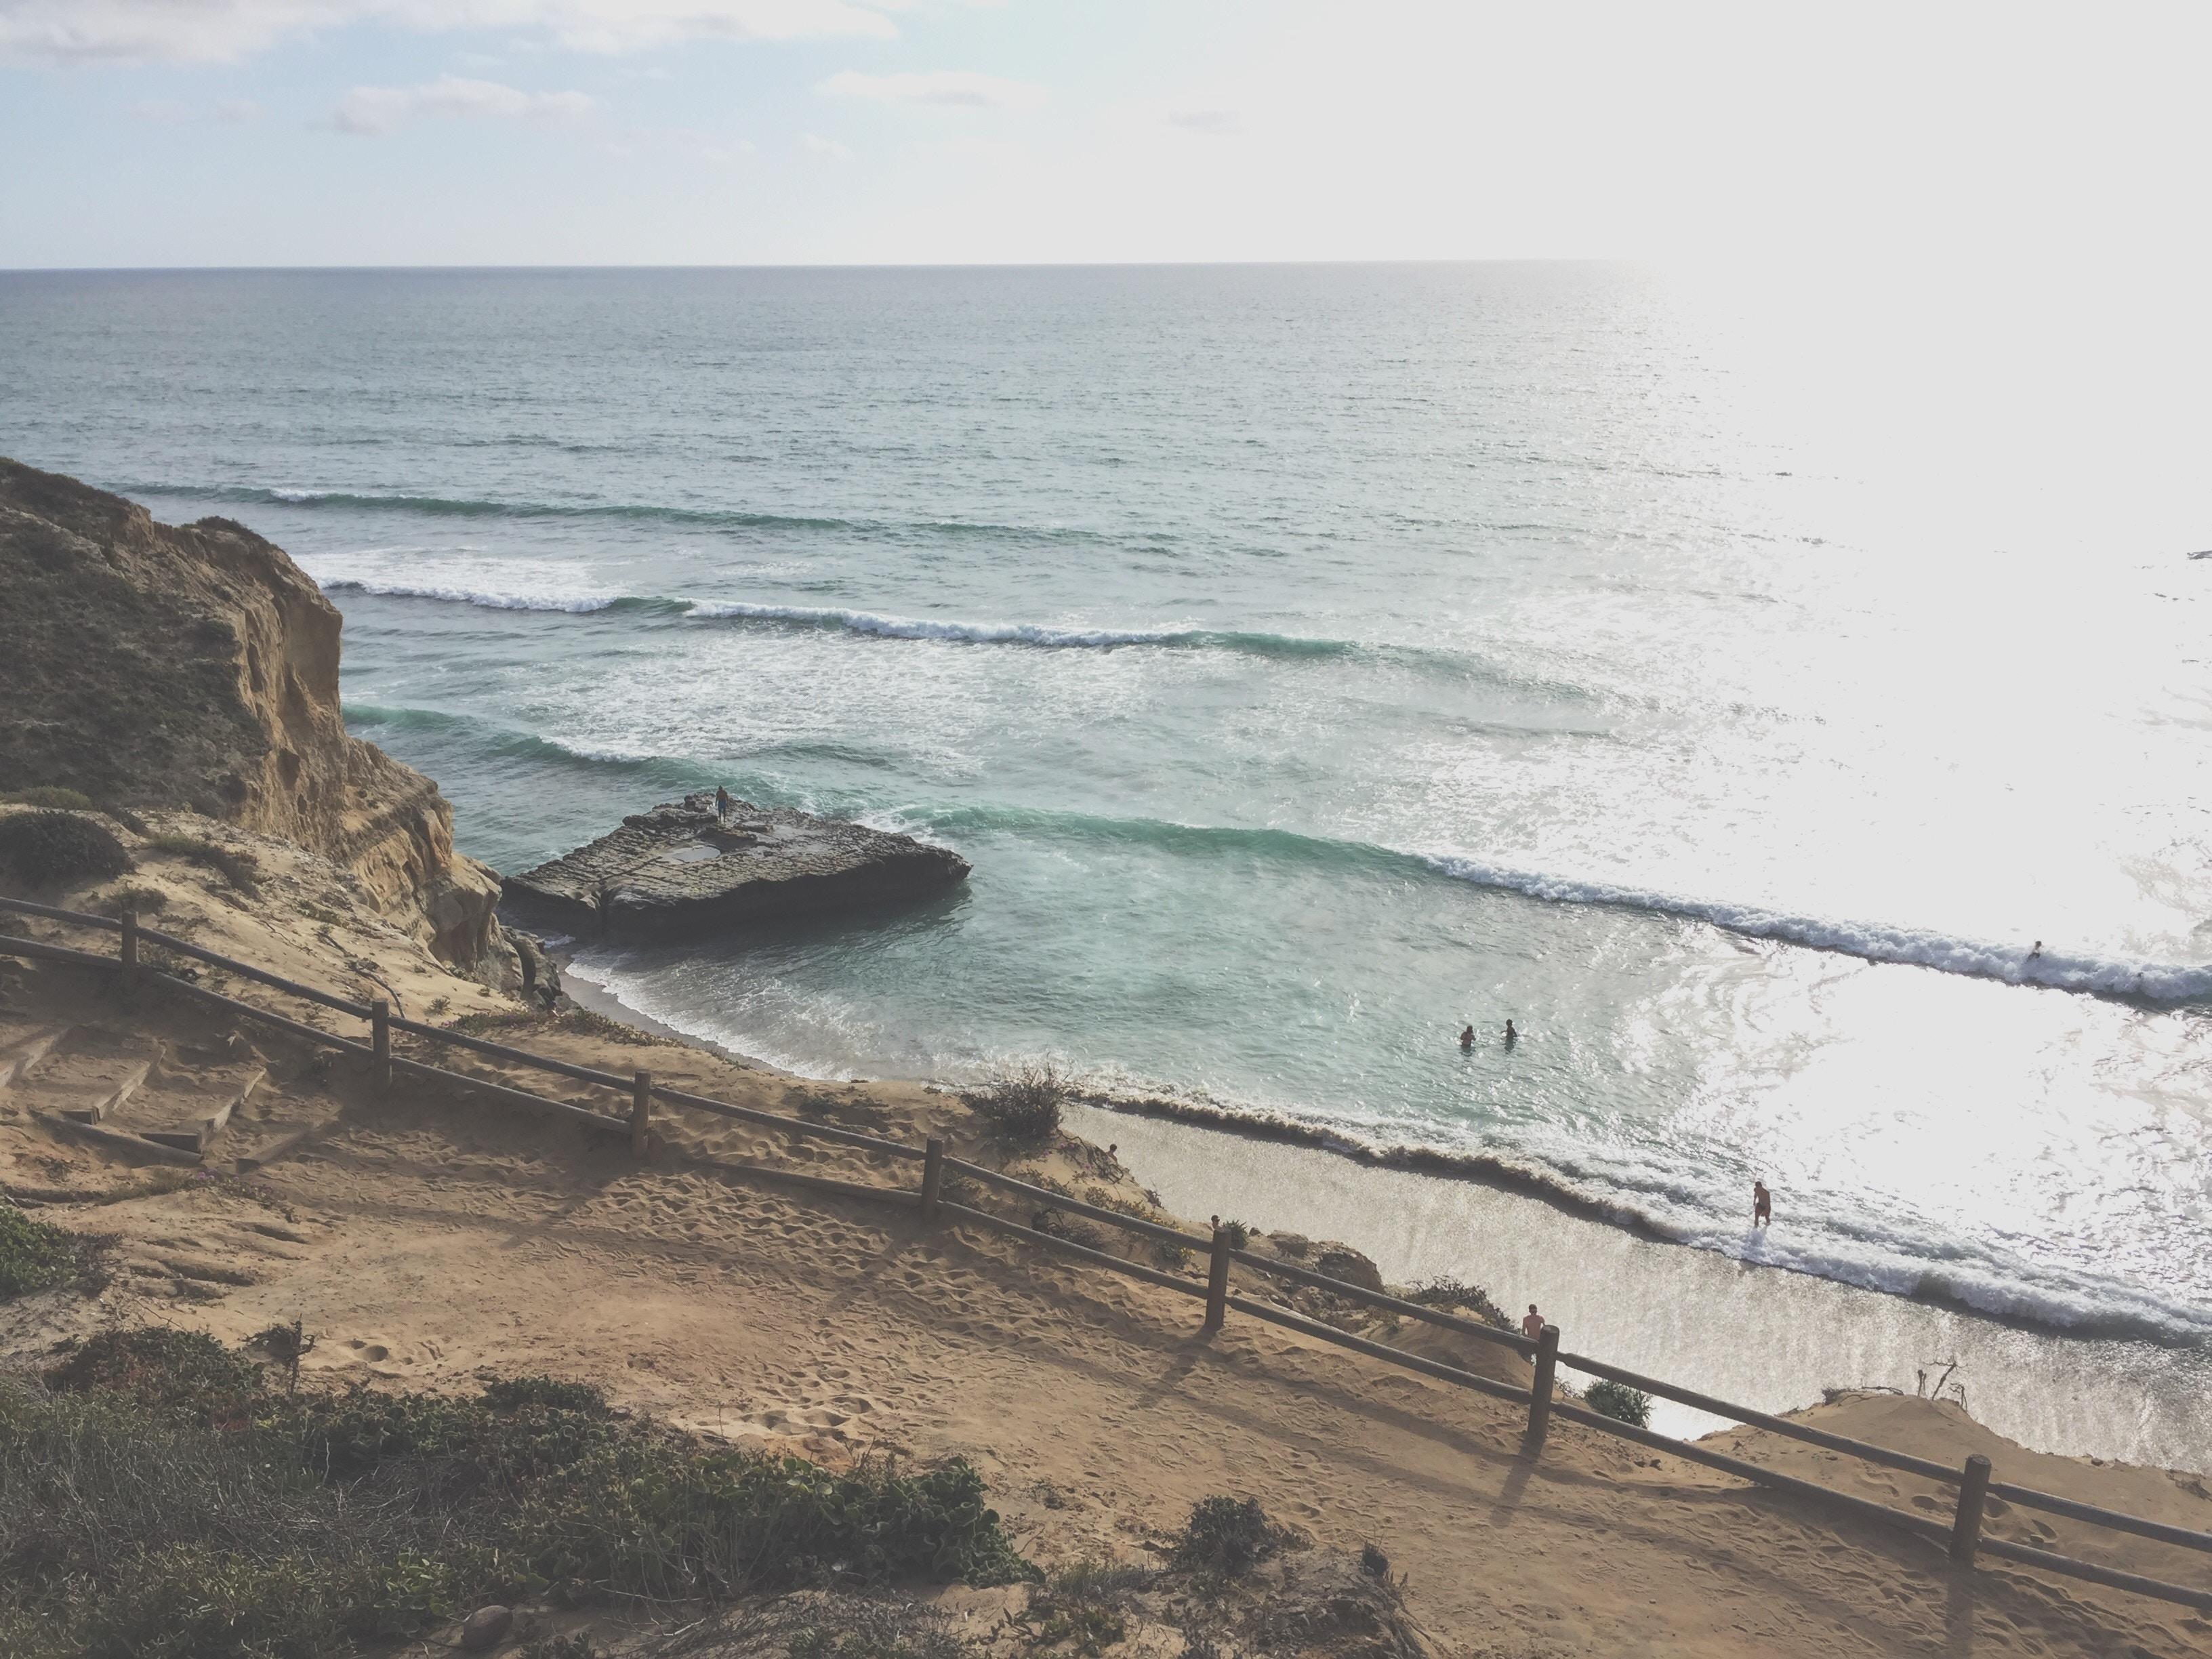 beach in San Diego